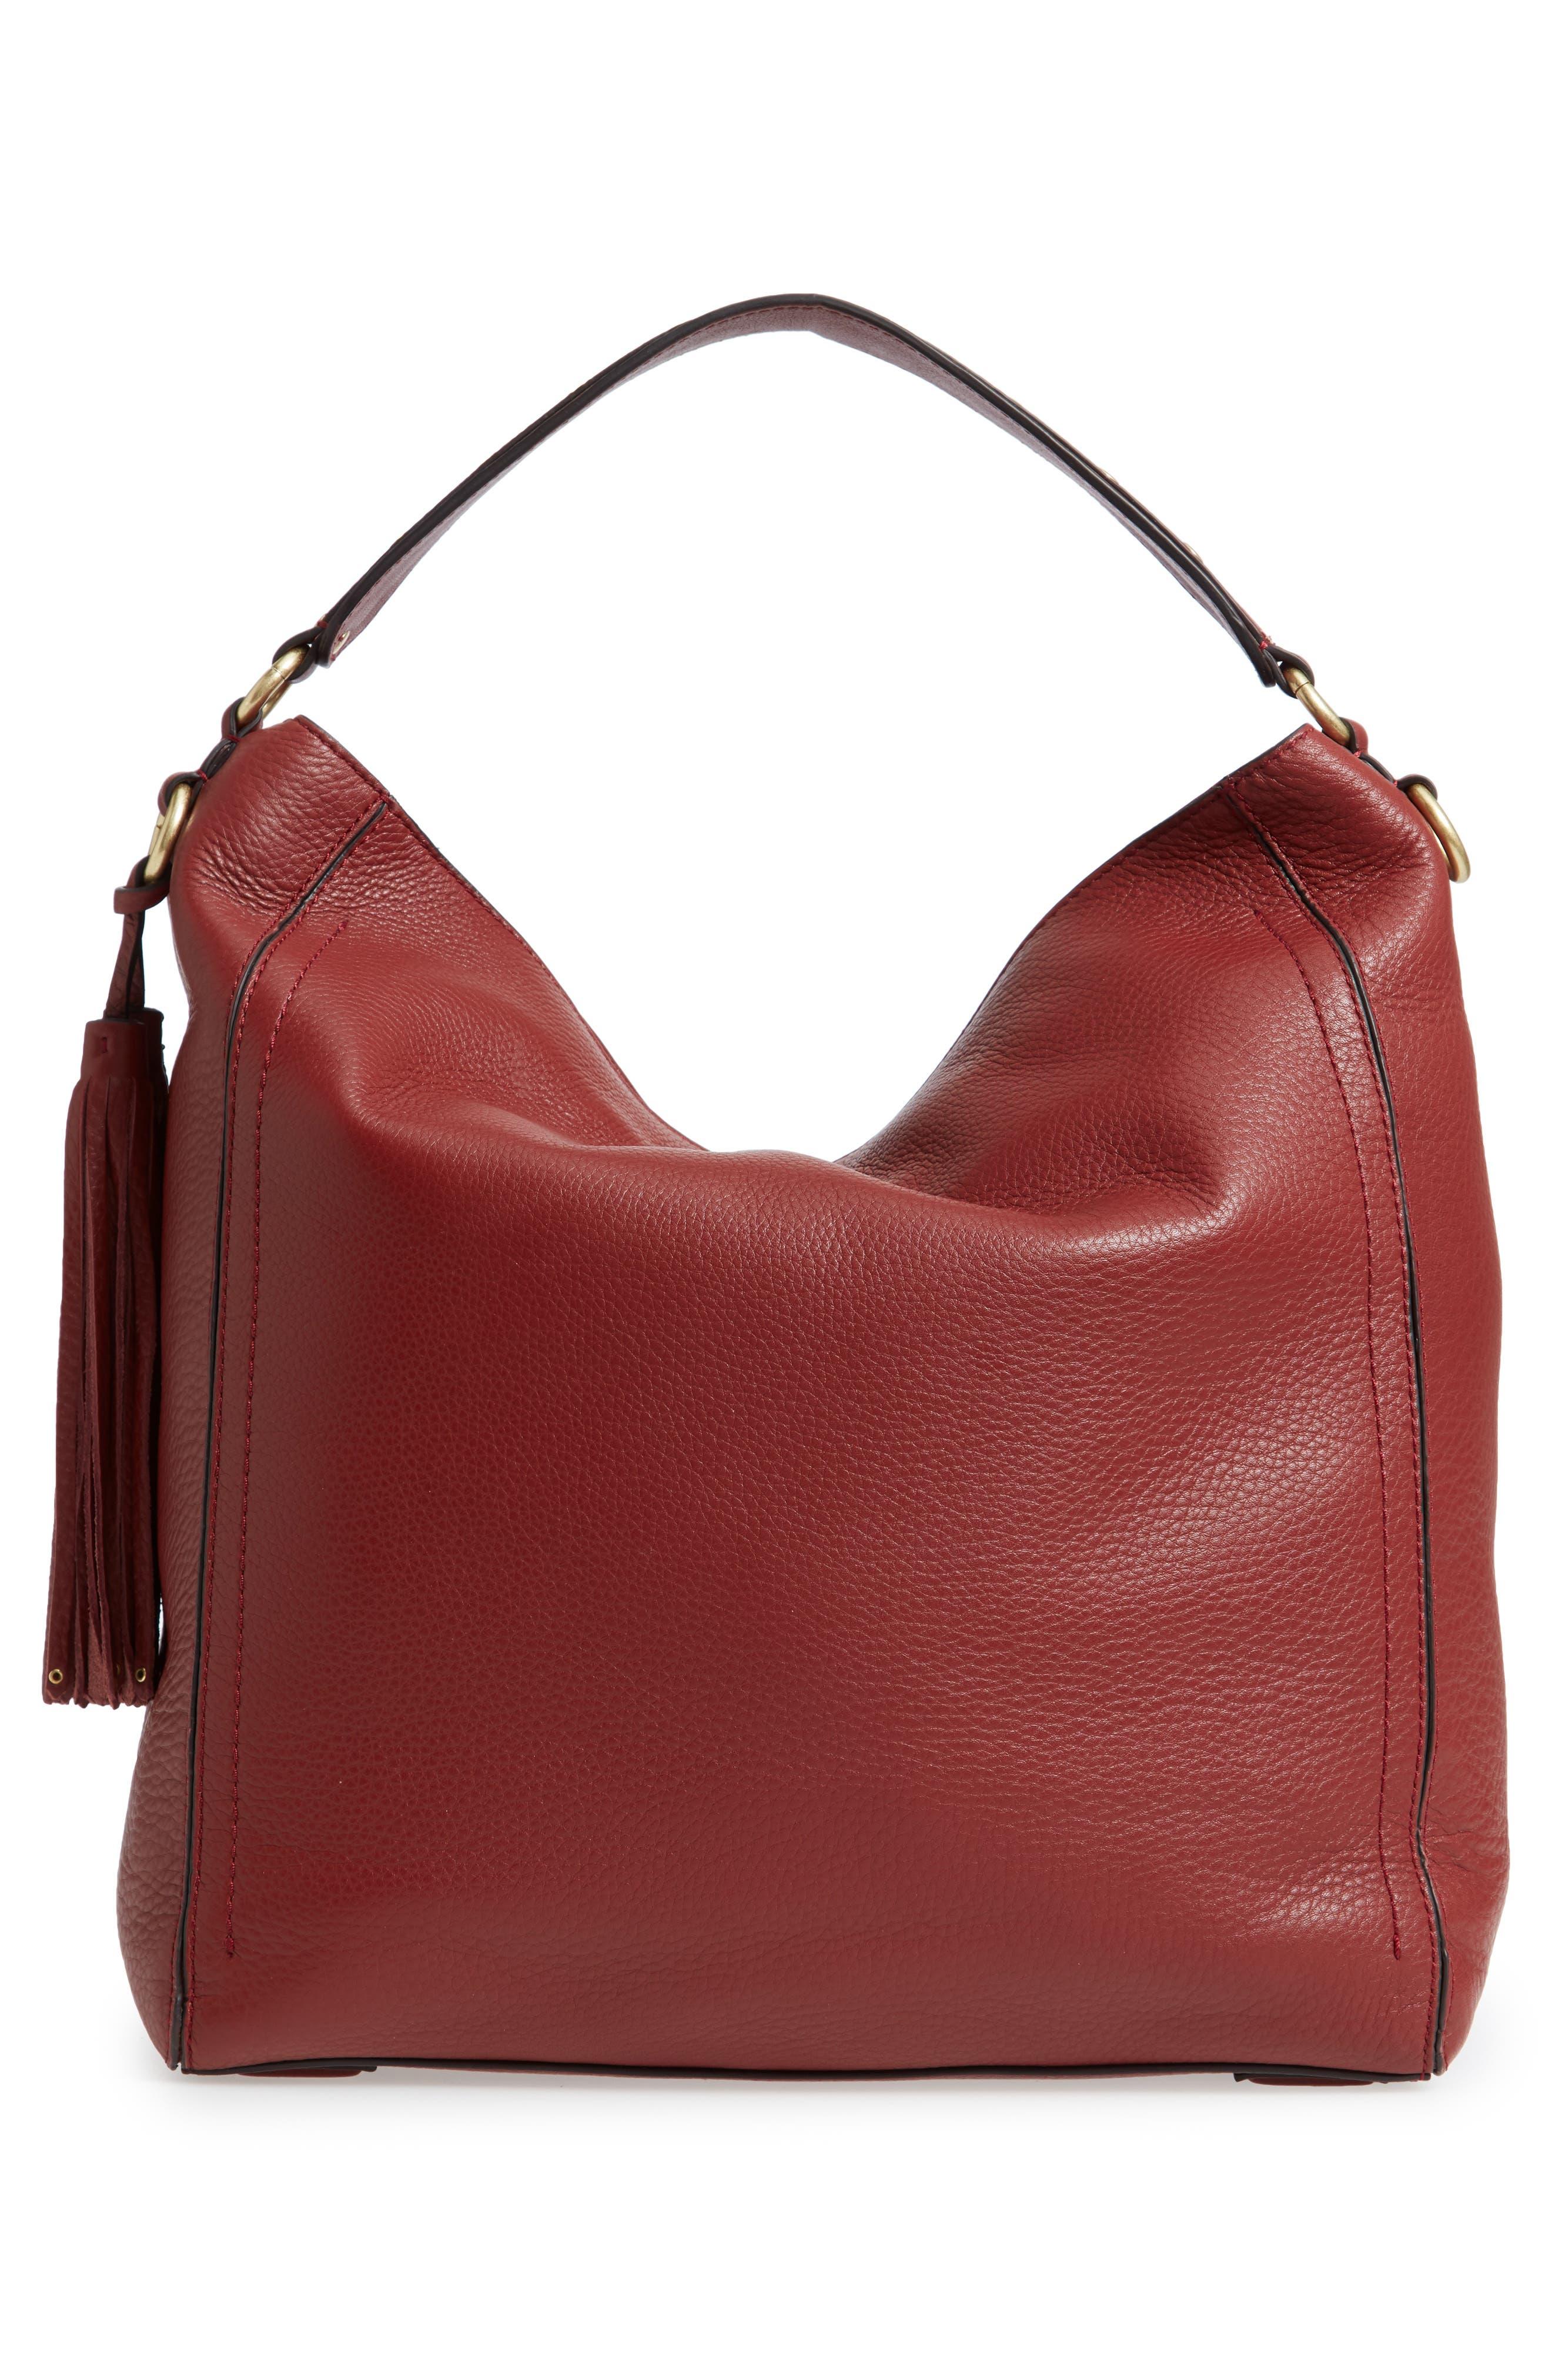 Cassidy RFID Pebbled Leather Bucket Bag,                             Alternate thumbnail 10, color,